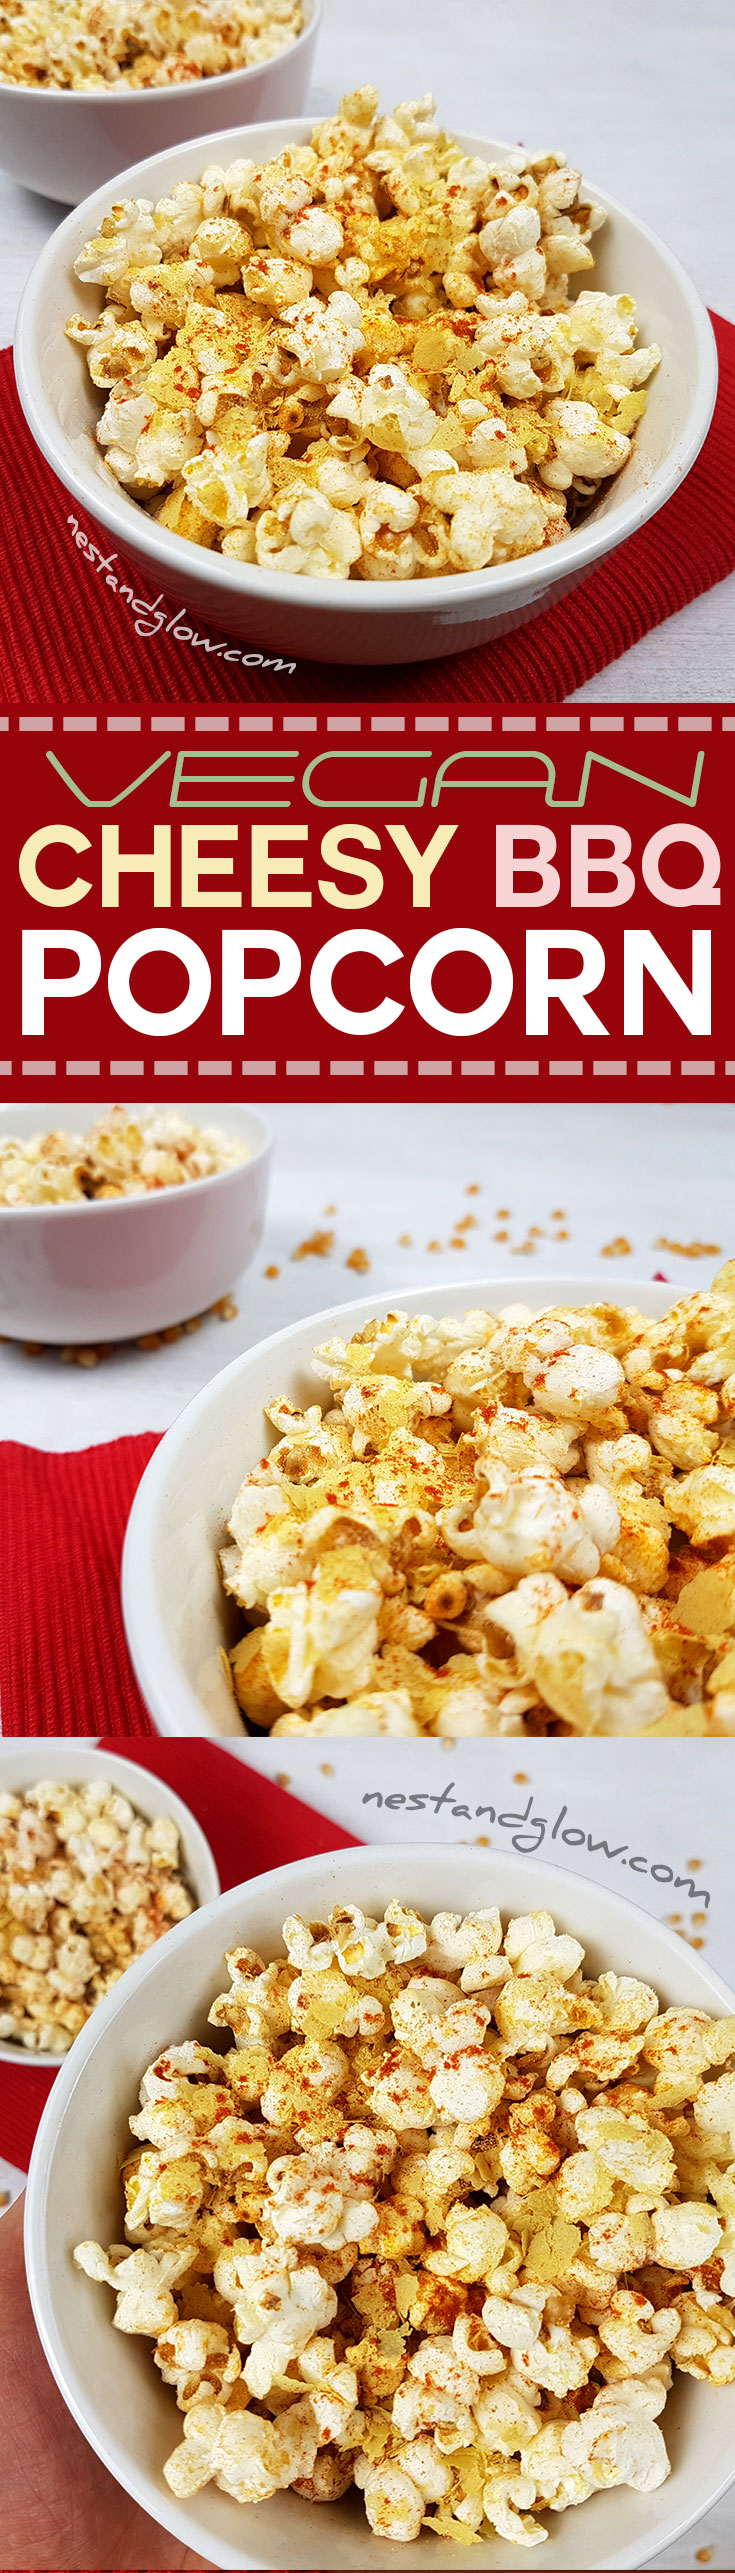 Cheesy Vegan BBQ Popcorn Healthy Recipe (Dairy and Gluten ...